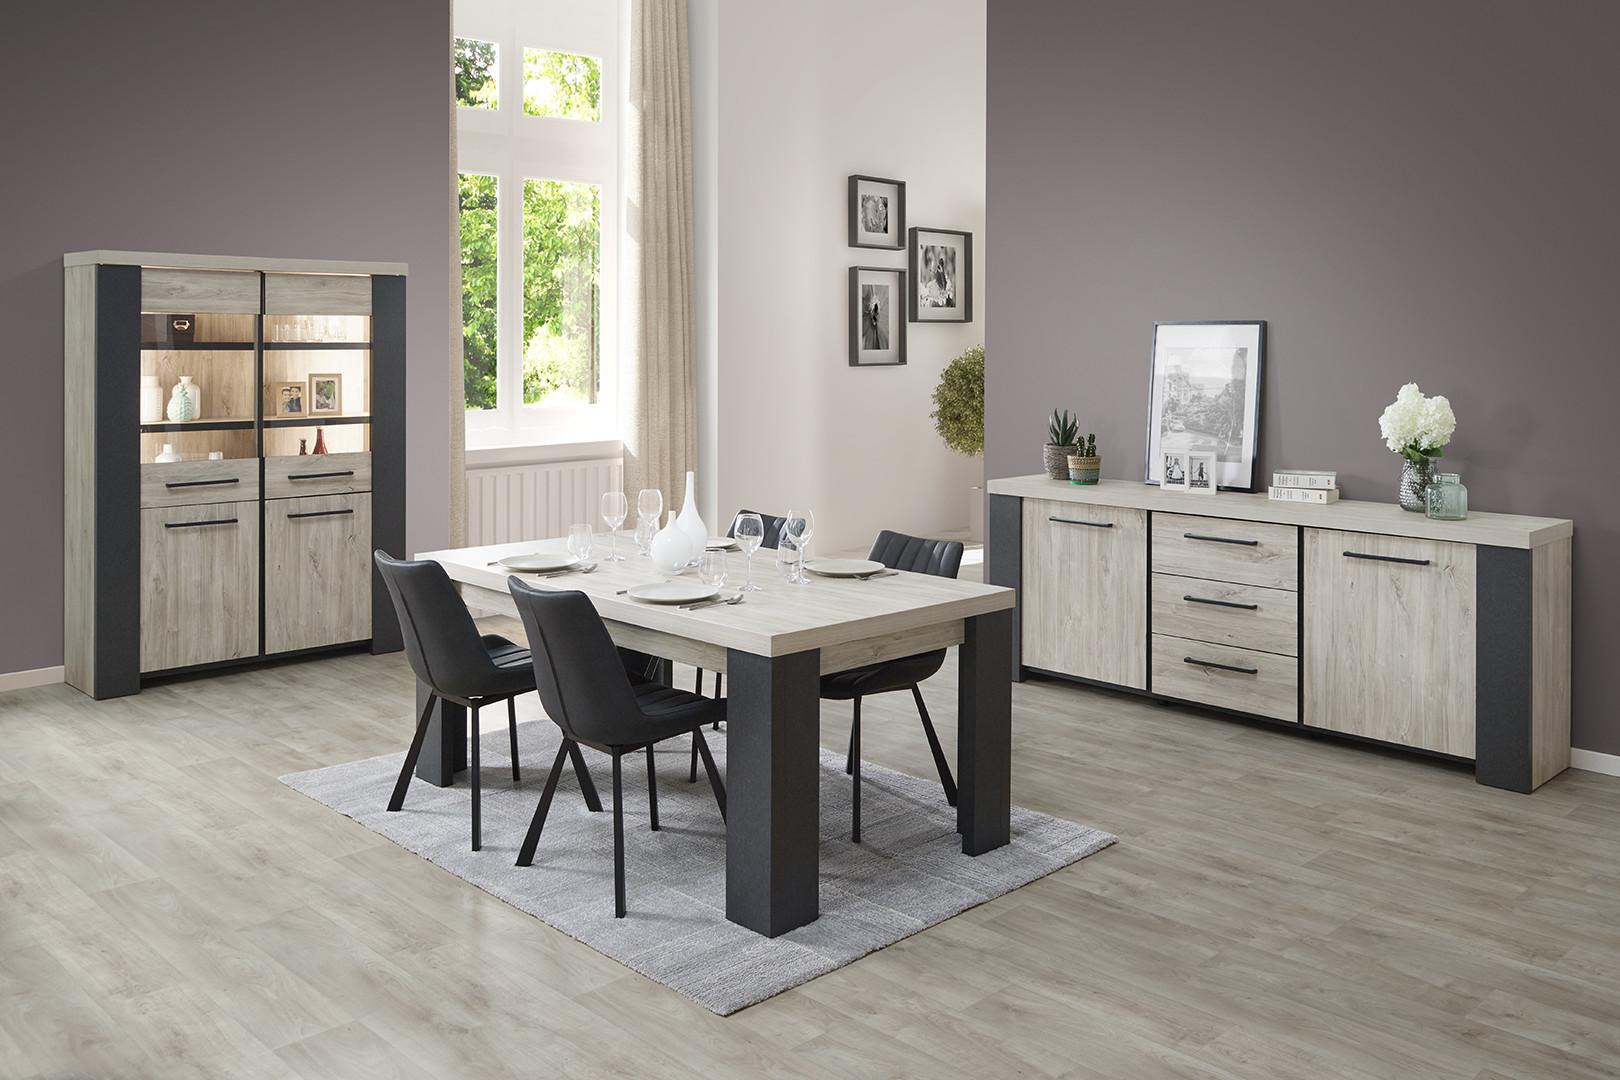 Salle à manger moderne chêne/gris Engueran